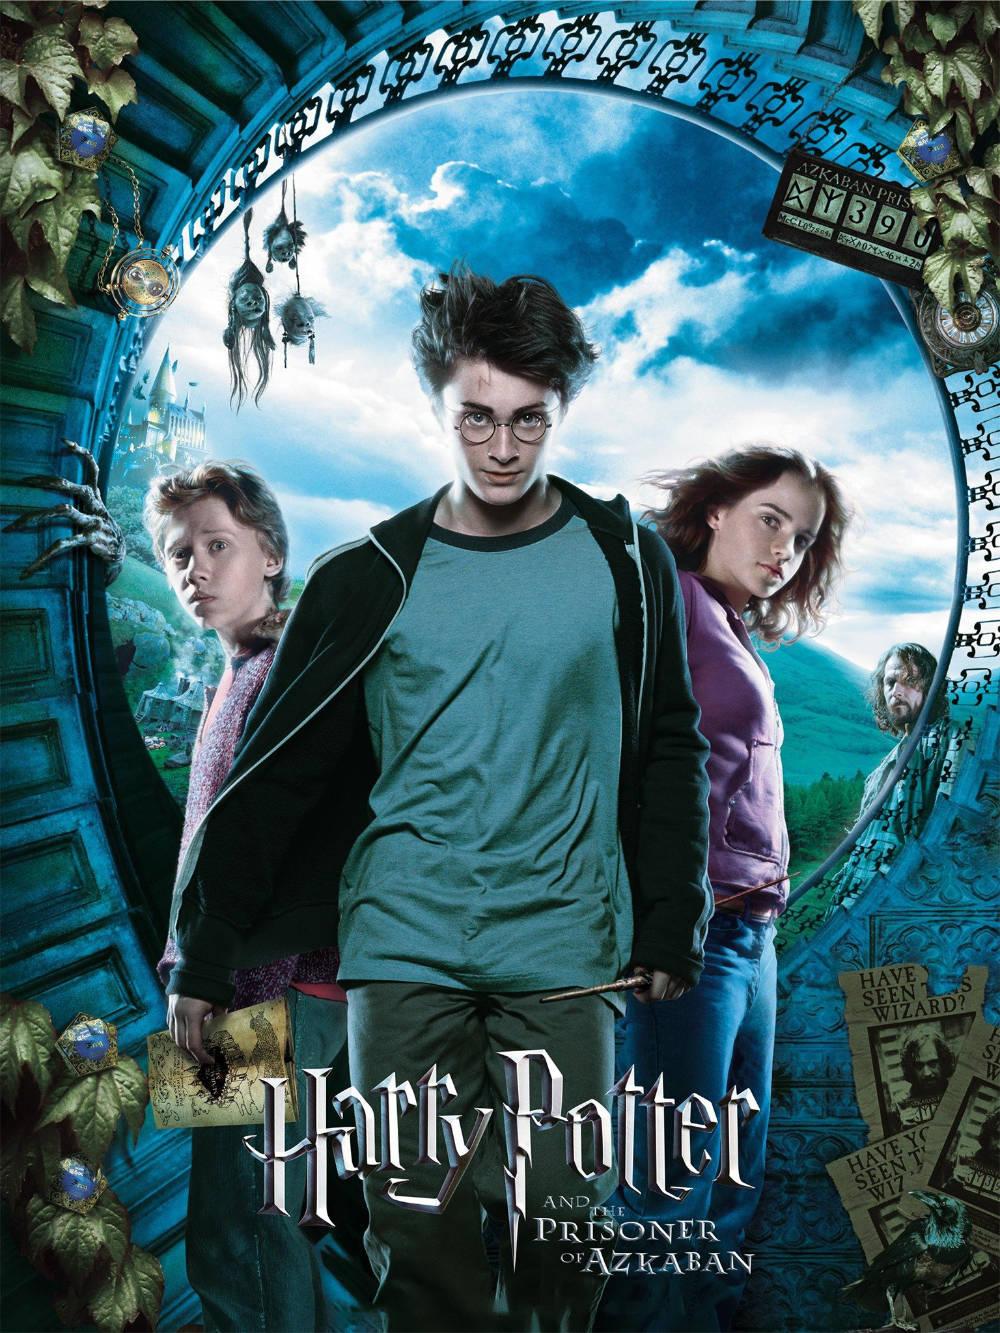 (Old) Film Review: Harry Potter and the Prisoner of Azkaban